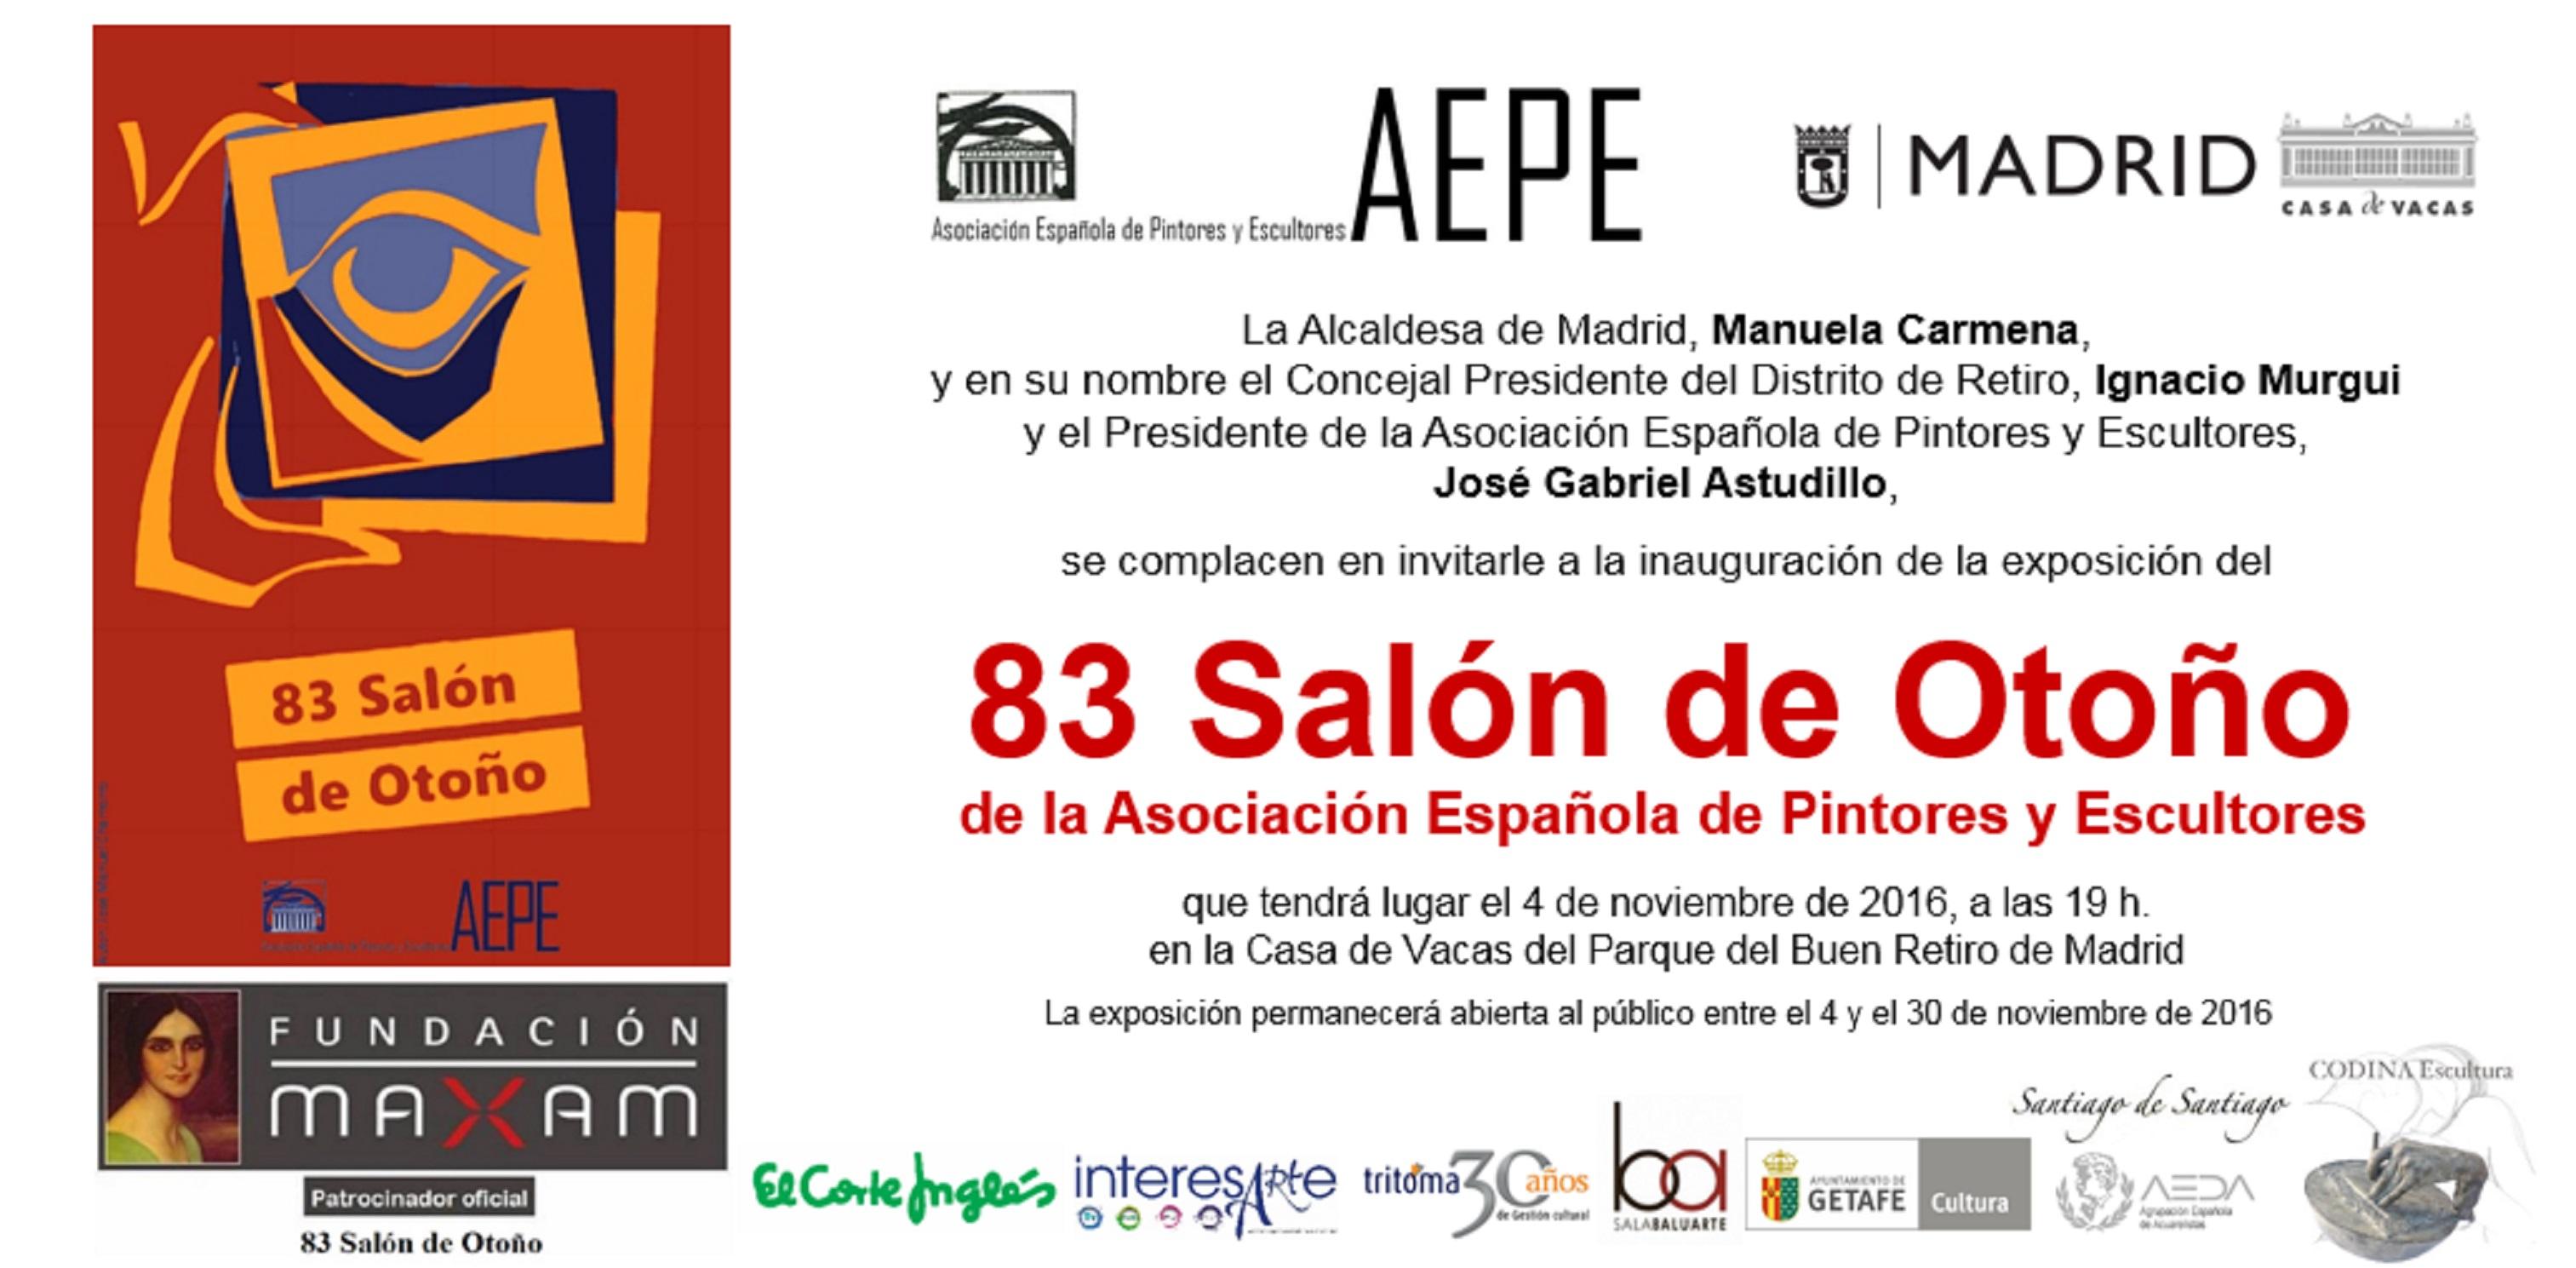 invitacion-aepe-83-salon-de-otono-2016